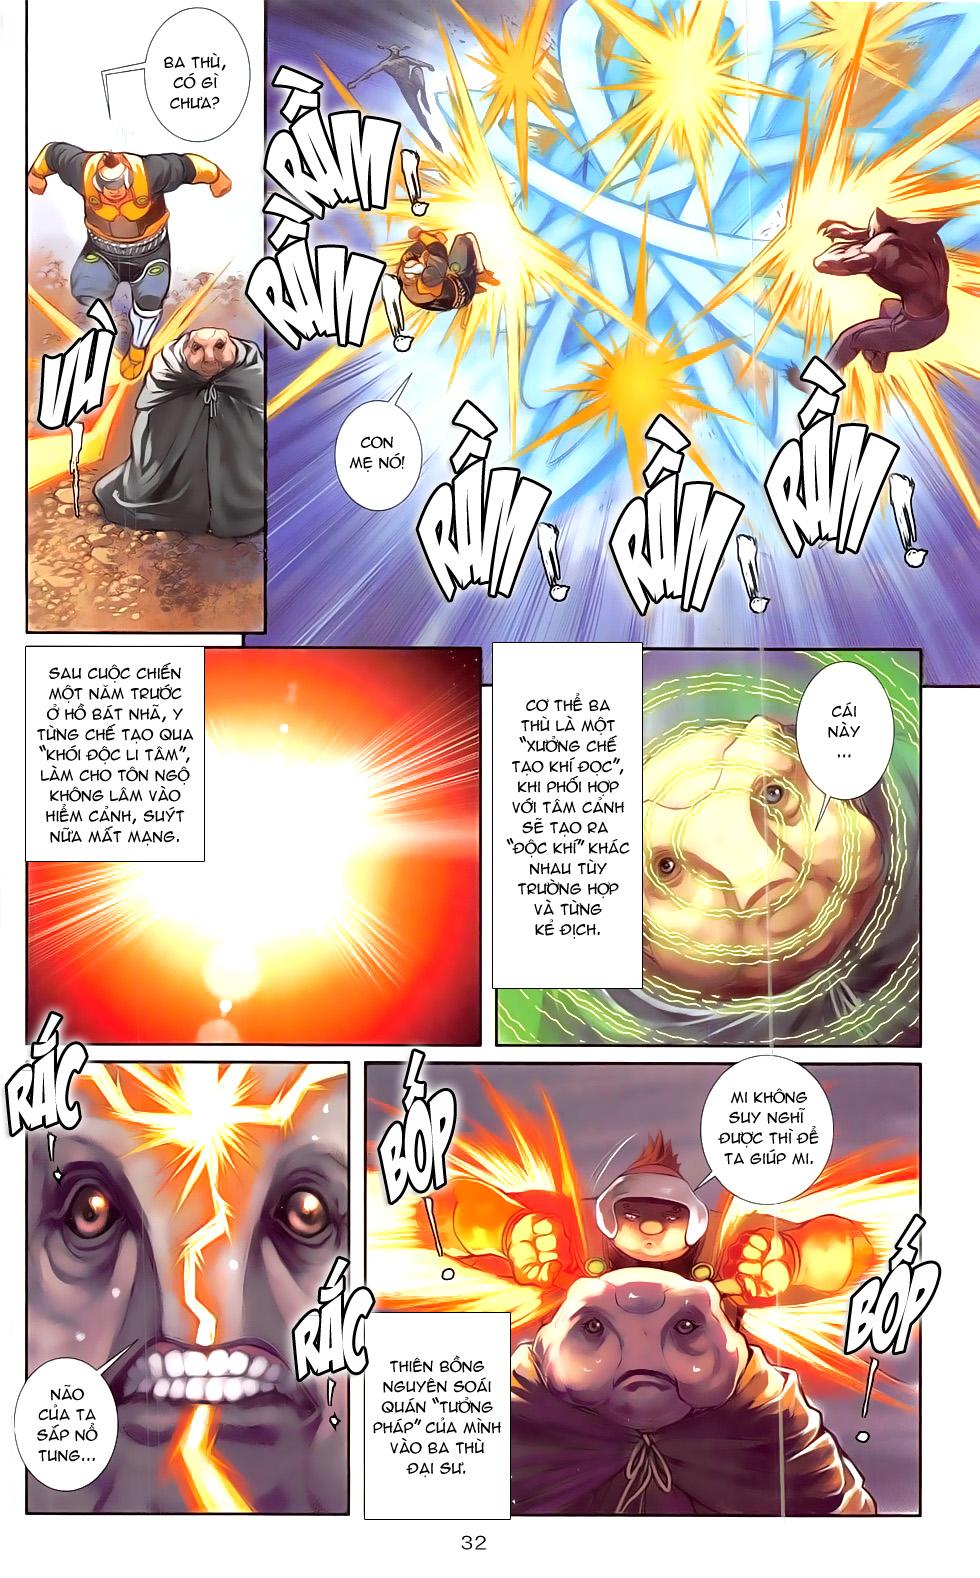 Thần Binh Đấu Giả (Saint Warrior)